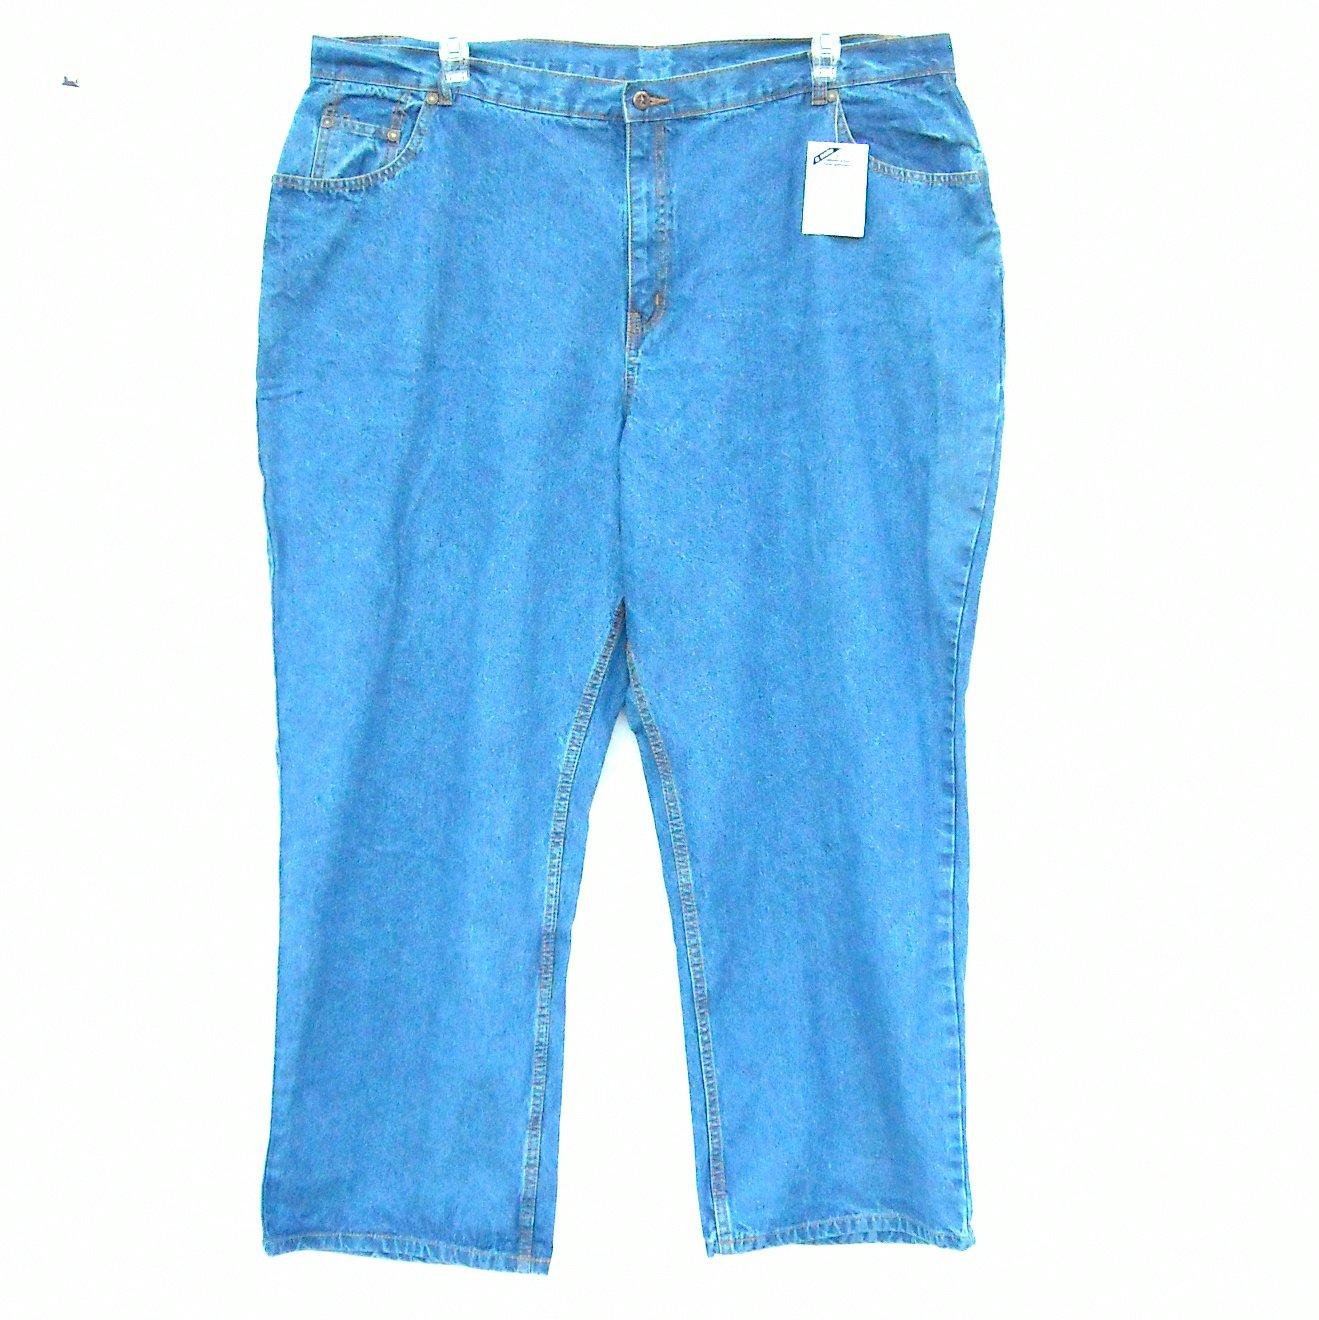 Mainstreet Blues Women's Plus Size Blue Jeans 4X NWT